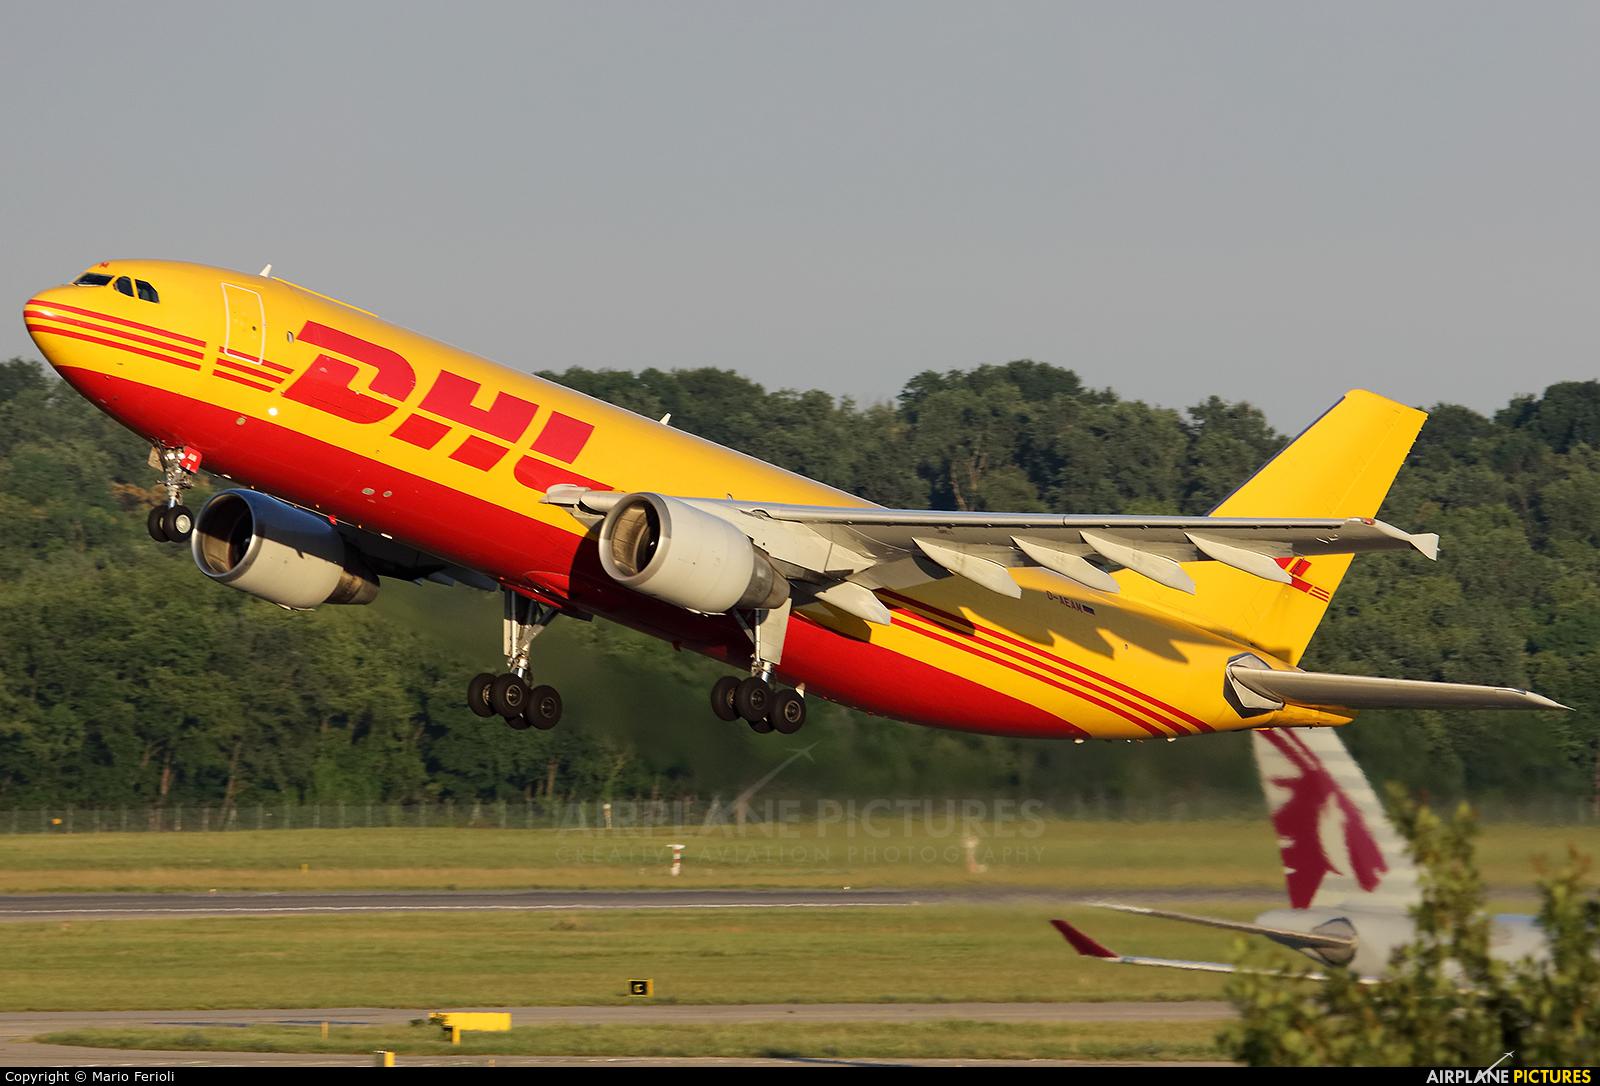 DHL Cargo D-AEAM aircraft at Milan - Malpensa